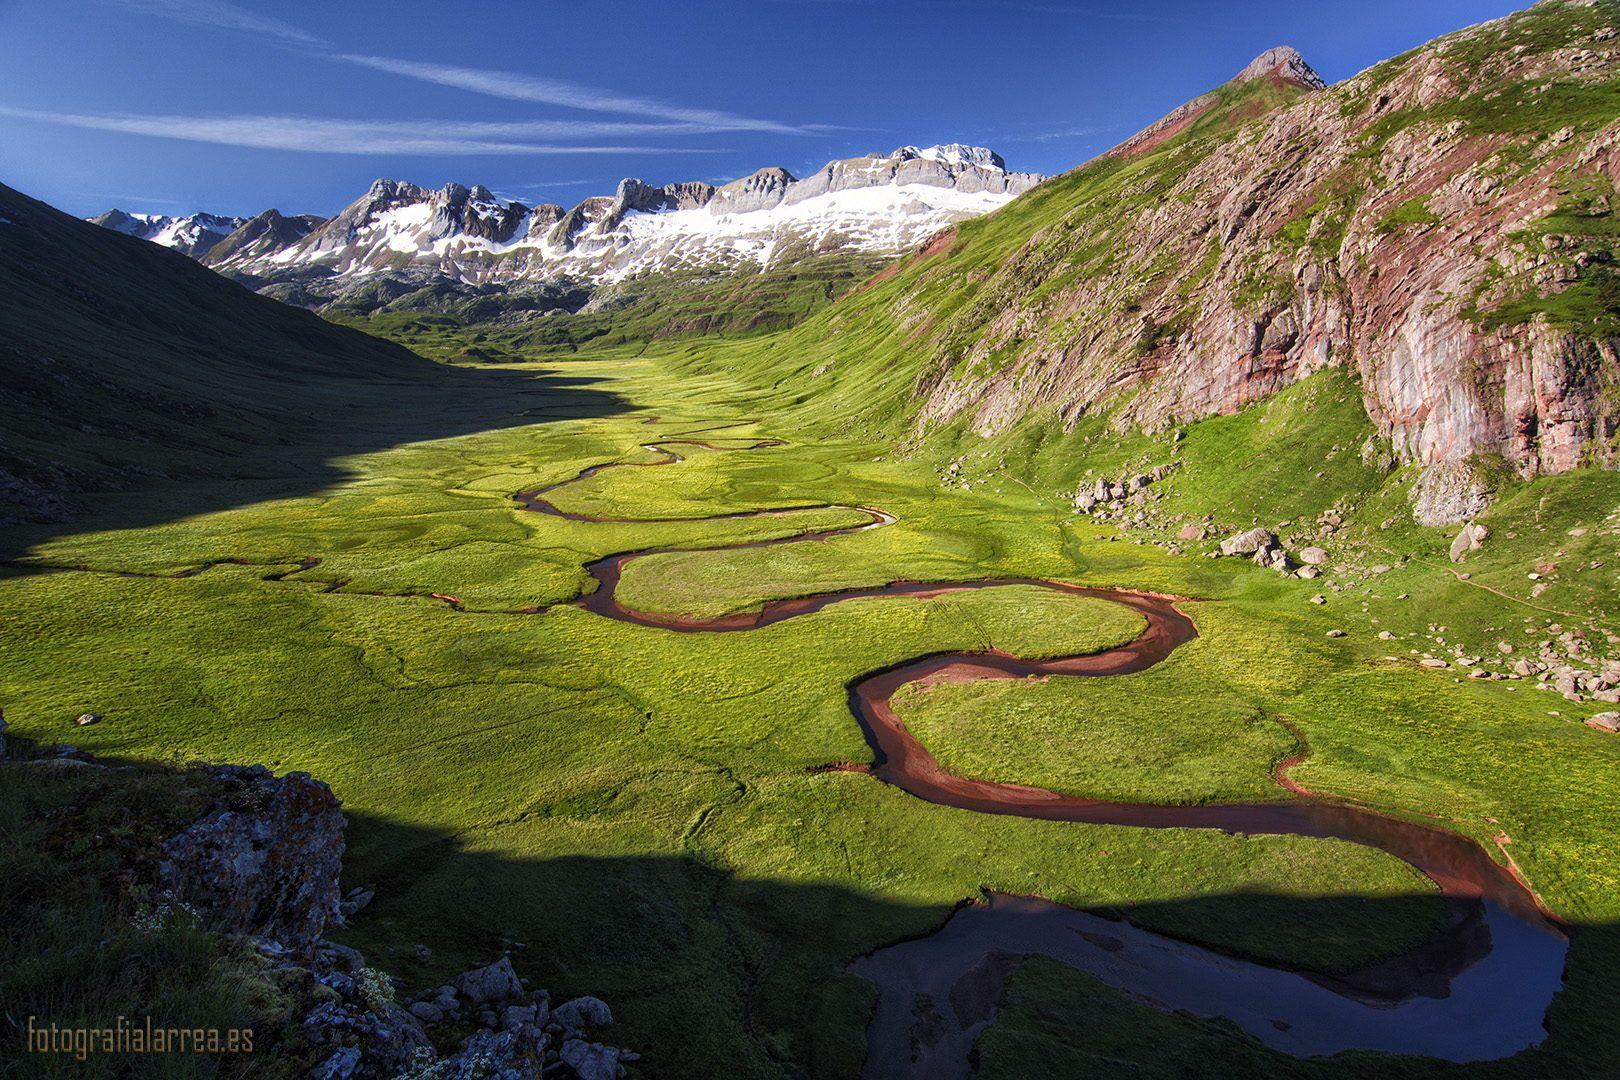 The Green And Red Valley Turismo De Naturaleza Parques Nacionales Pirineos